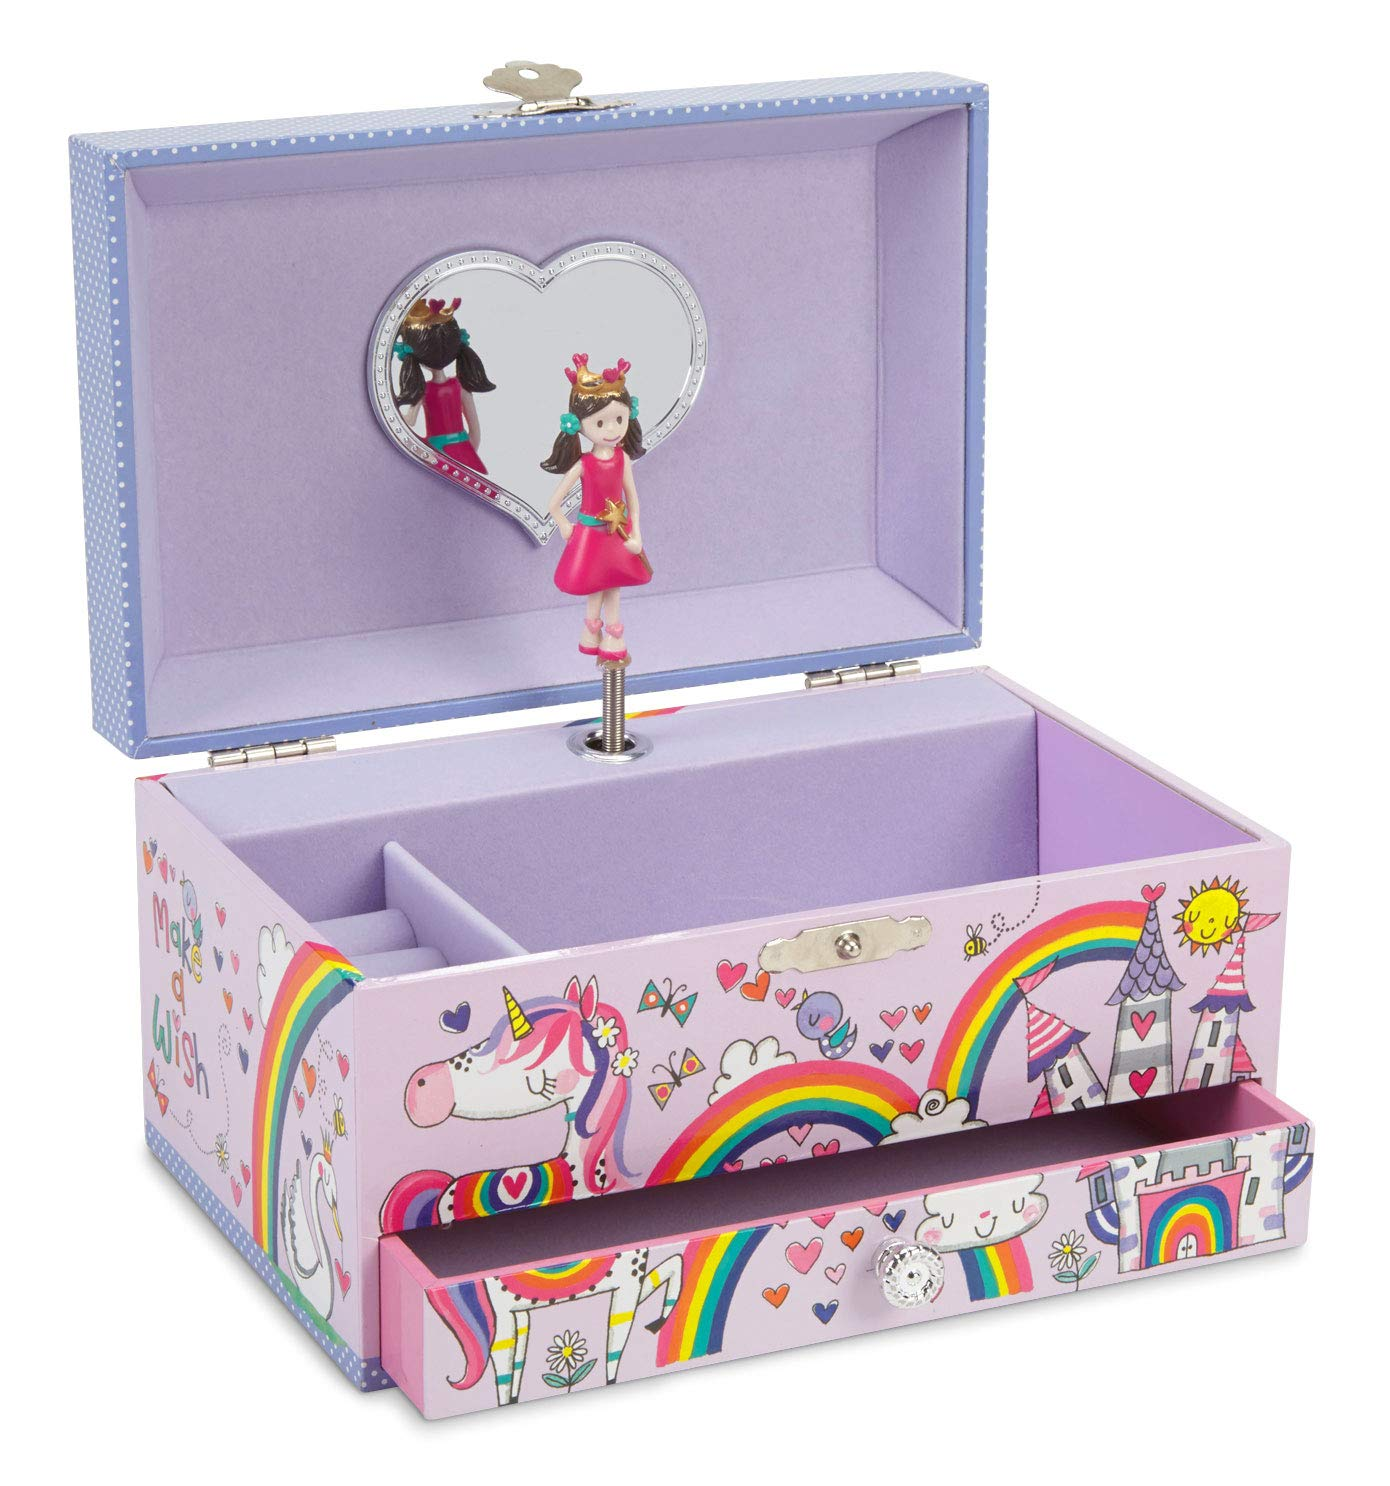 JewelKeeper Unicorn Princess Musical Jewelry Box with Pullout Drawer, Rainbow Glitter Finish, Dance The Sugar Plum Fairy Tune